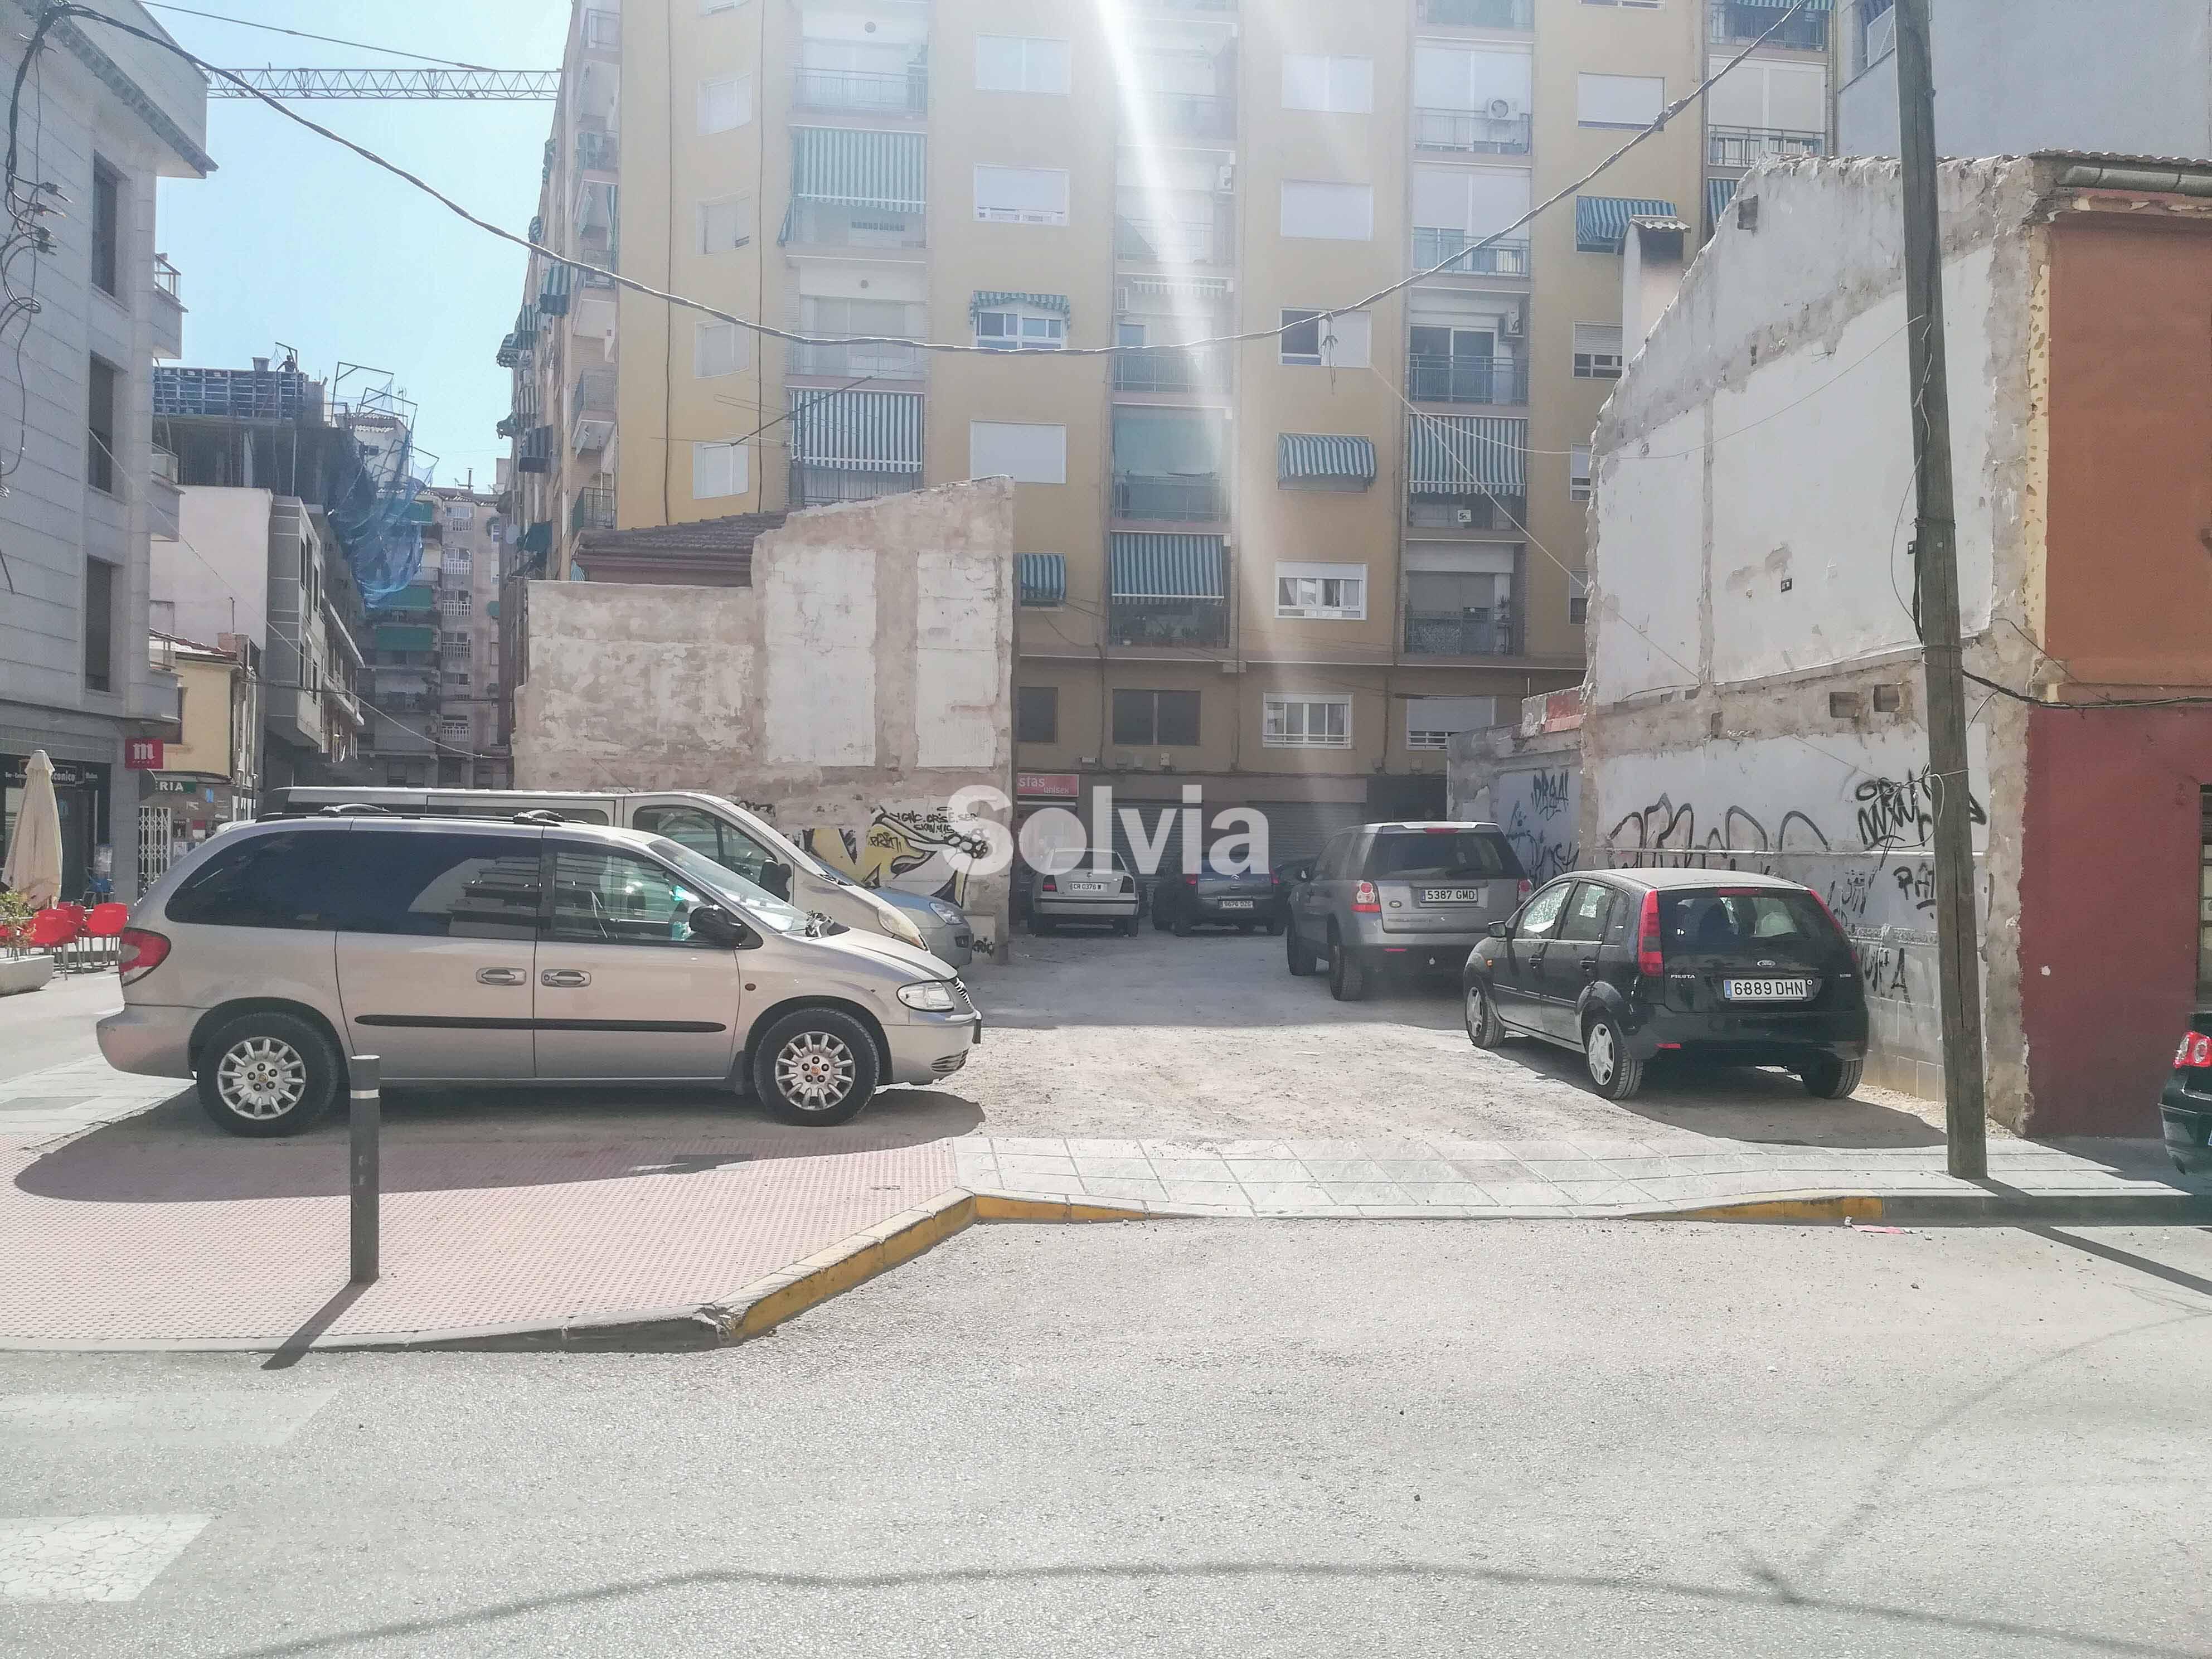 Solar urbà  C/ carmelitas. Solvia inmobiliaria - suelo urbano Orihuela